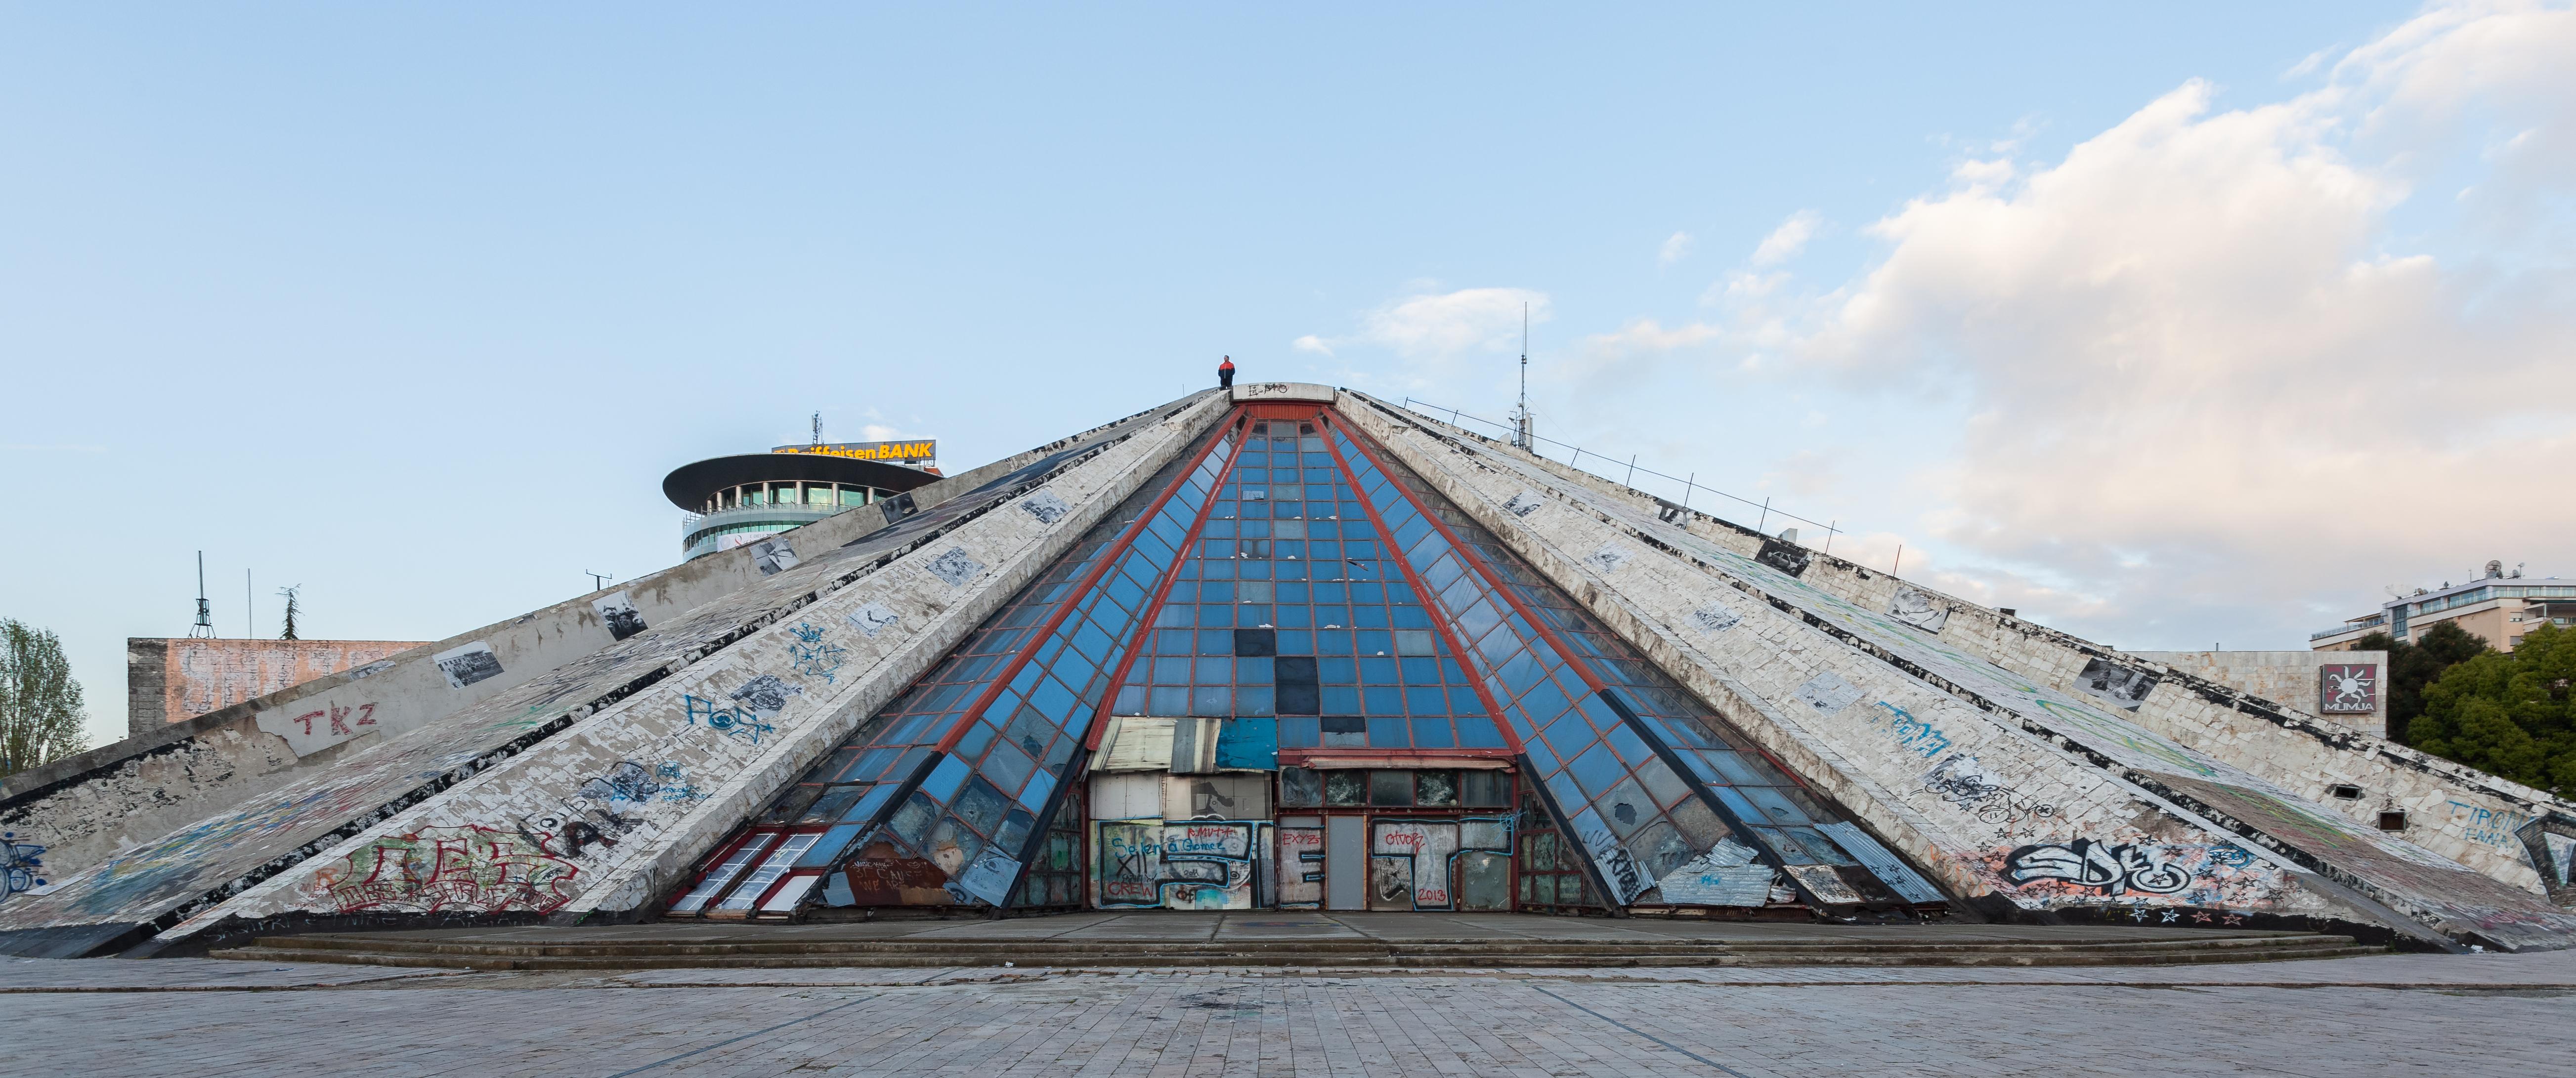 piramide en tirana